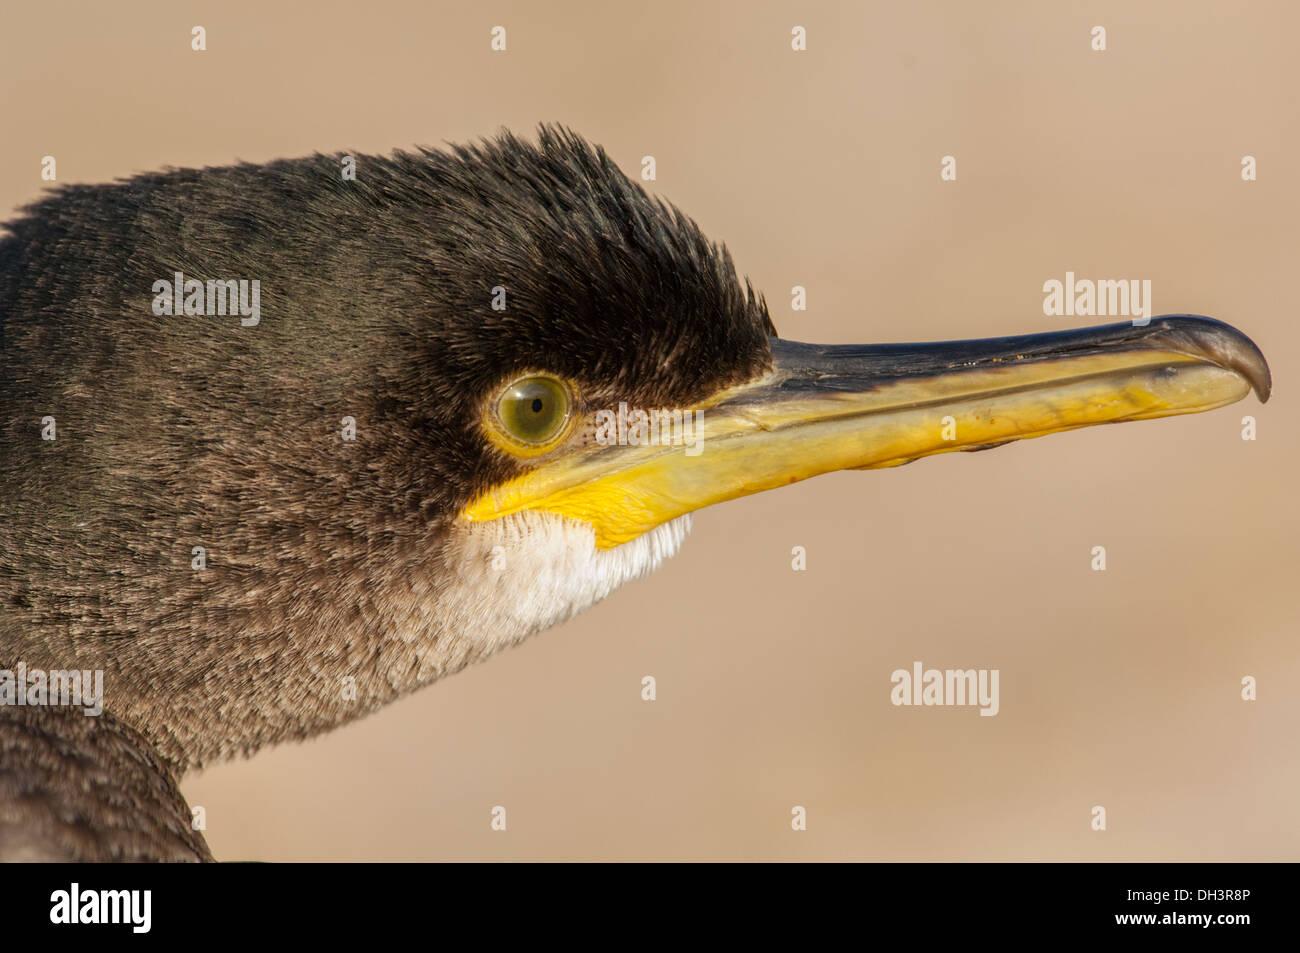 Common Shag (Phalacrocorax aristotelis), head portrait. - Stock Image